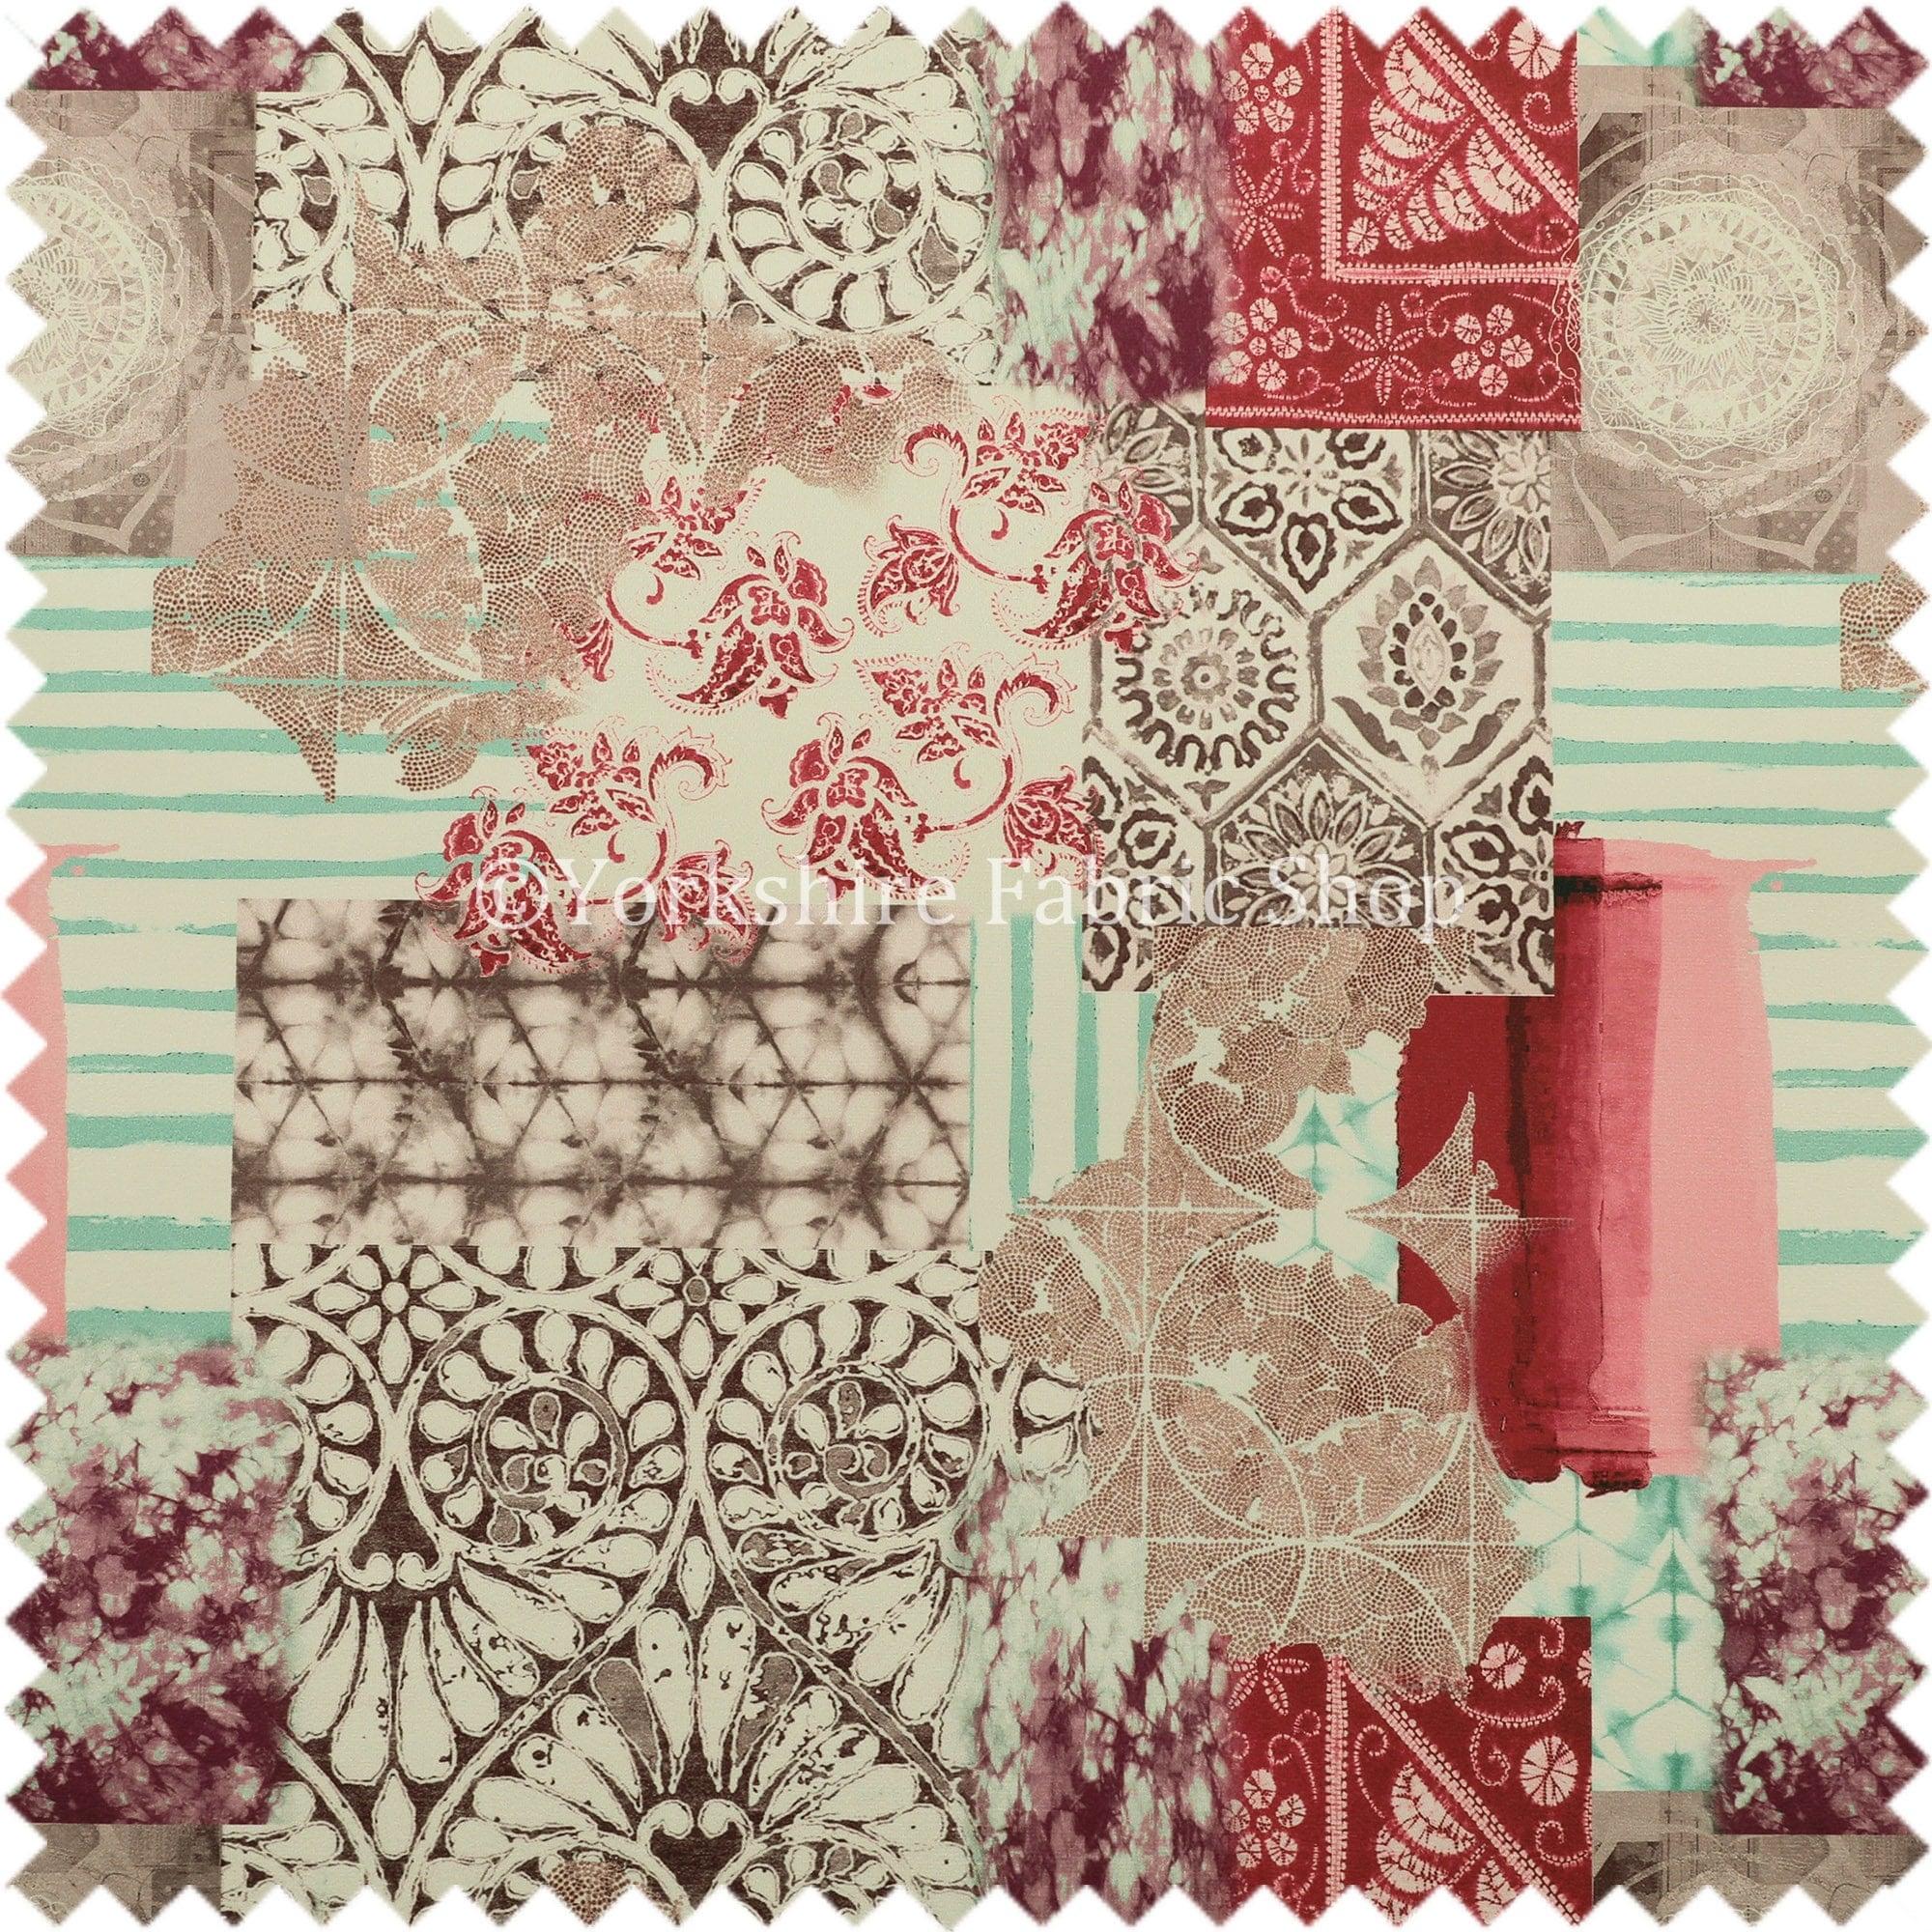 Tapicer a de geom trica patchwork rosa terciopelo impreso - Telas para tapiceria ...